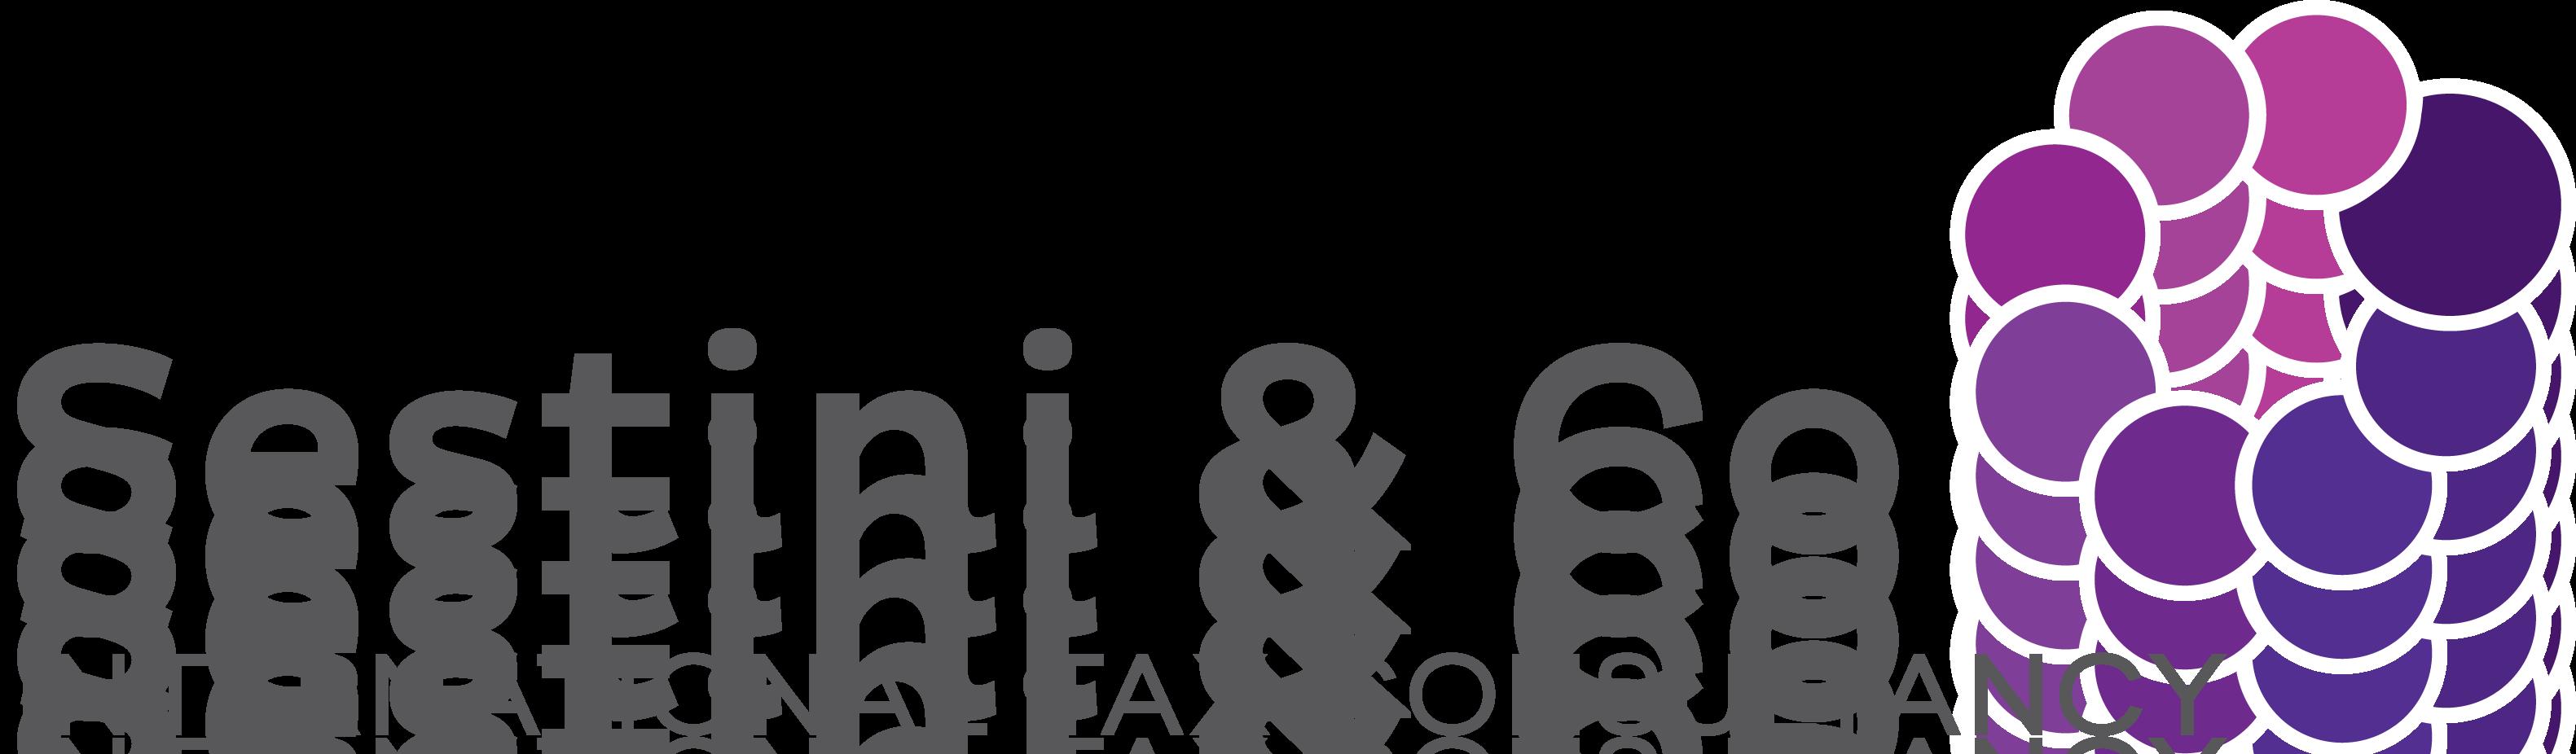 Sestini & Co International Tax Consultancy logo